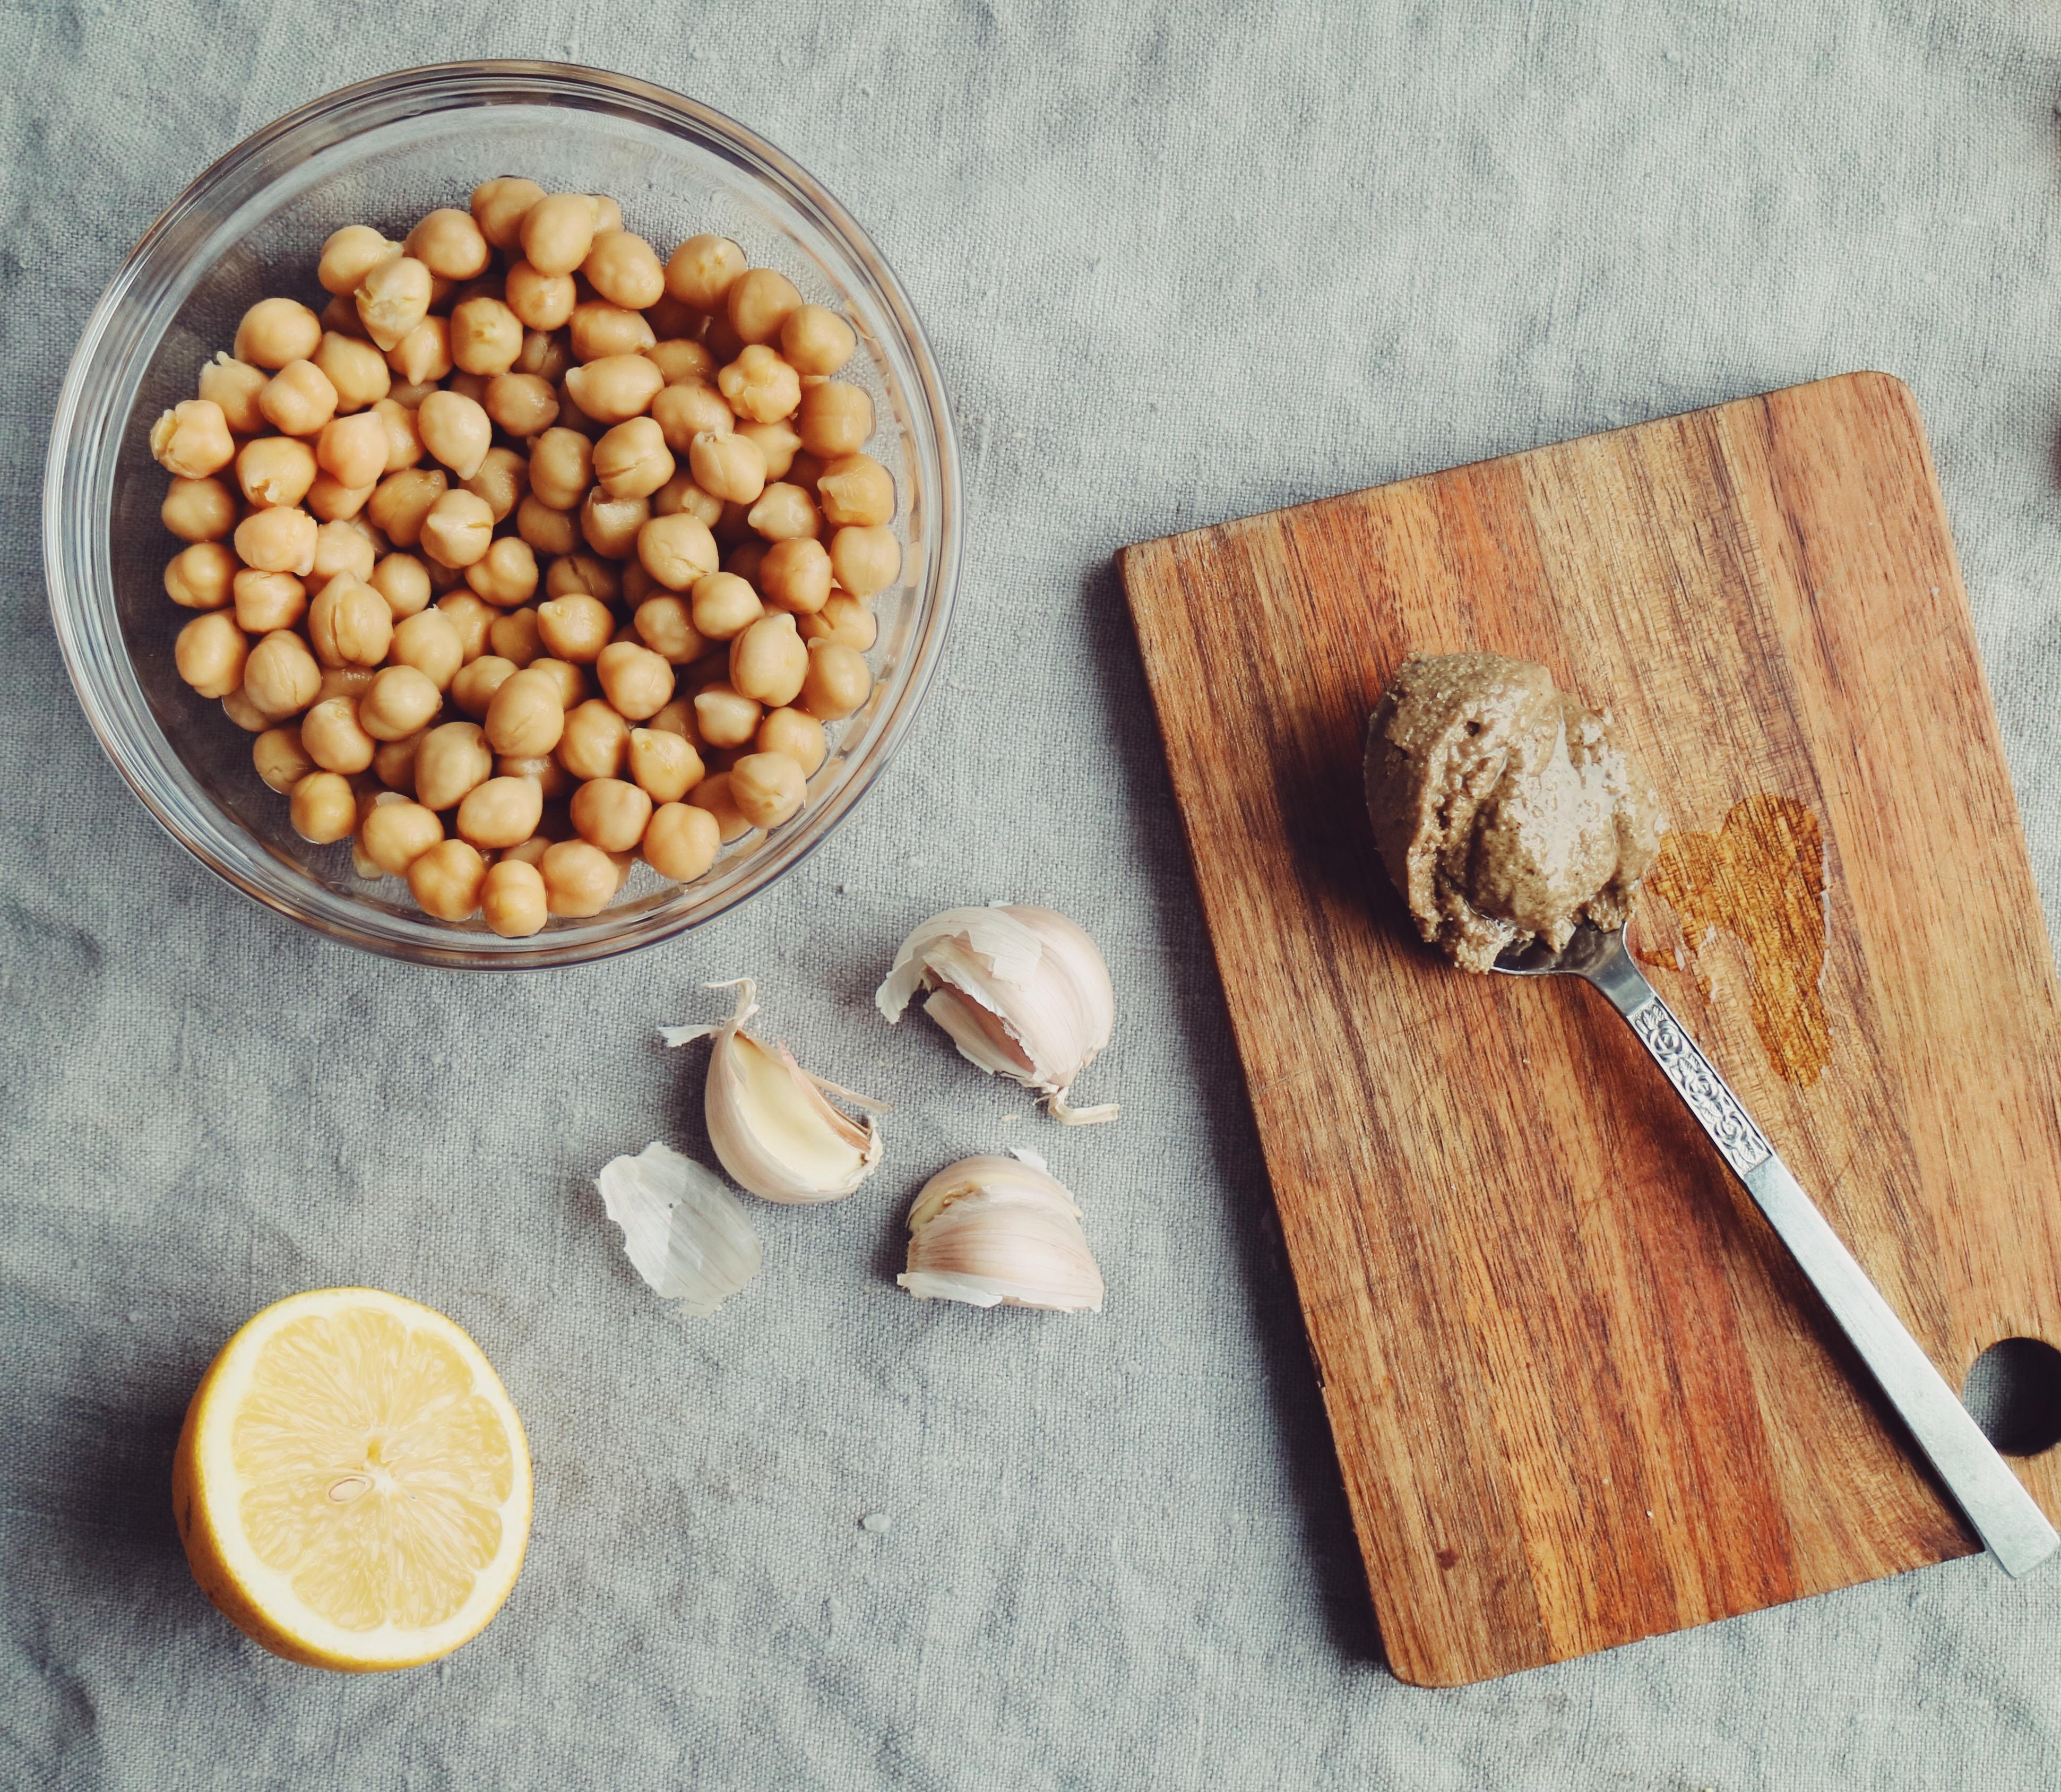 matlada-hummus-vegan-healthy-lifestyle